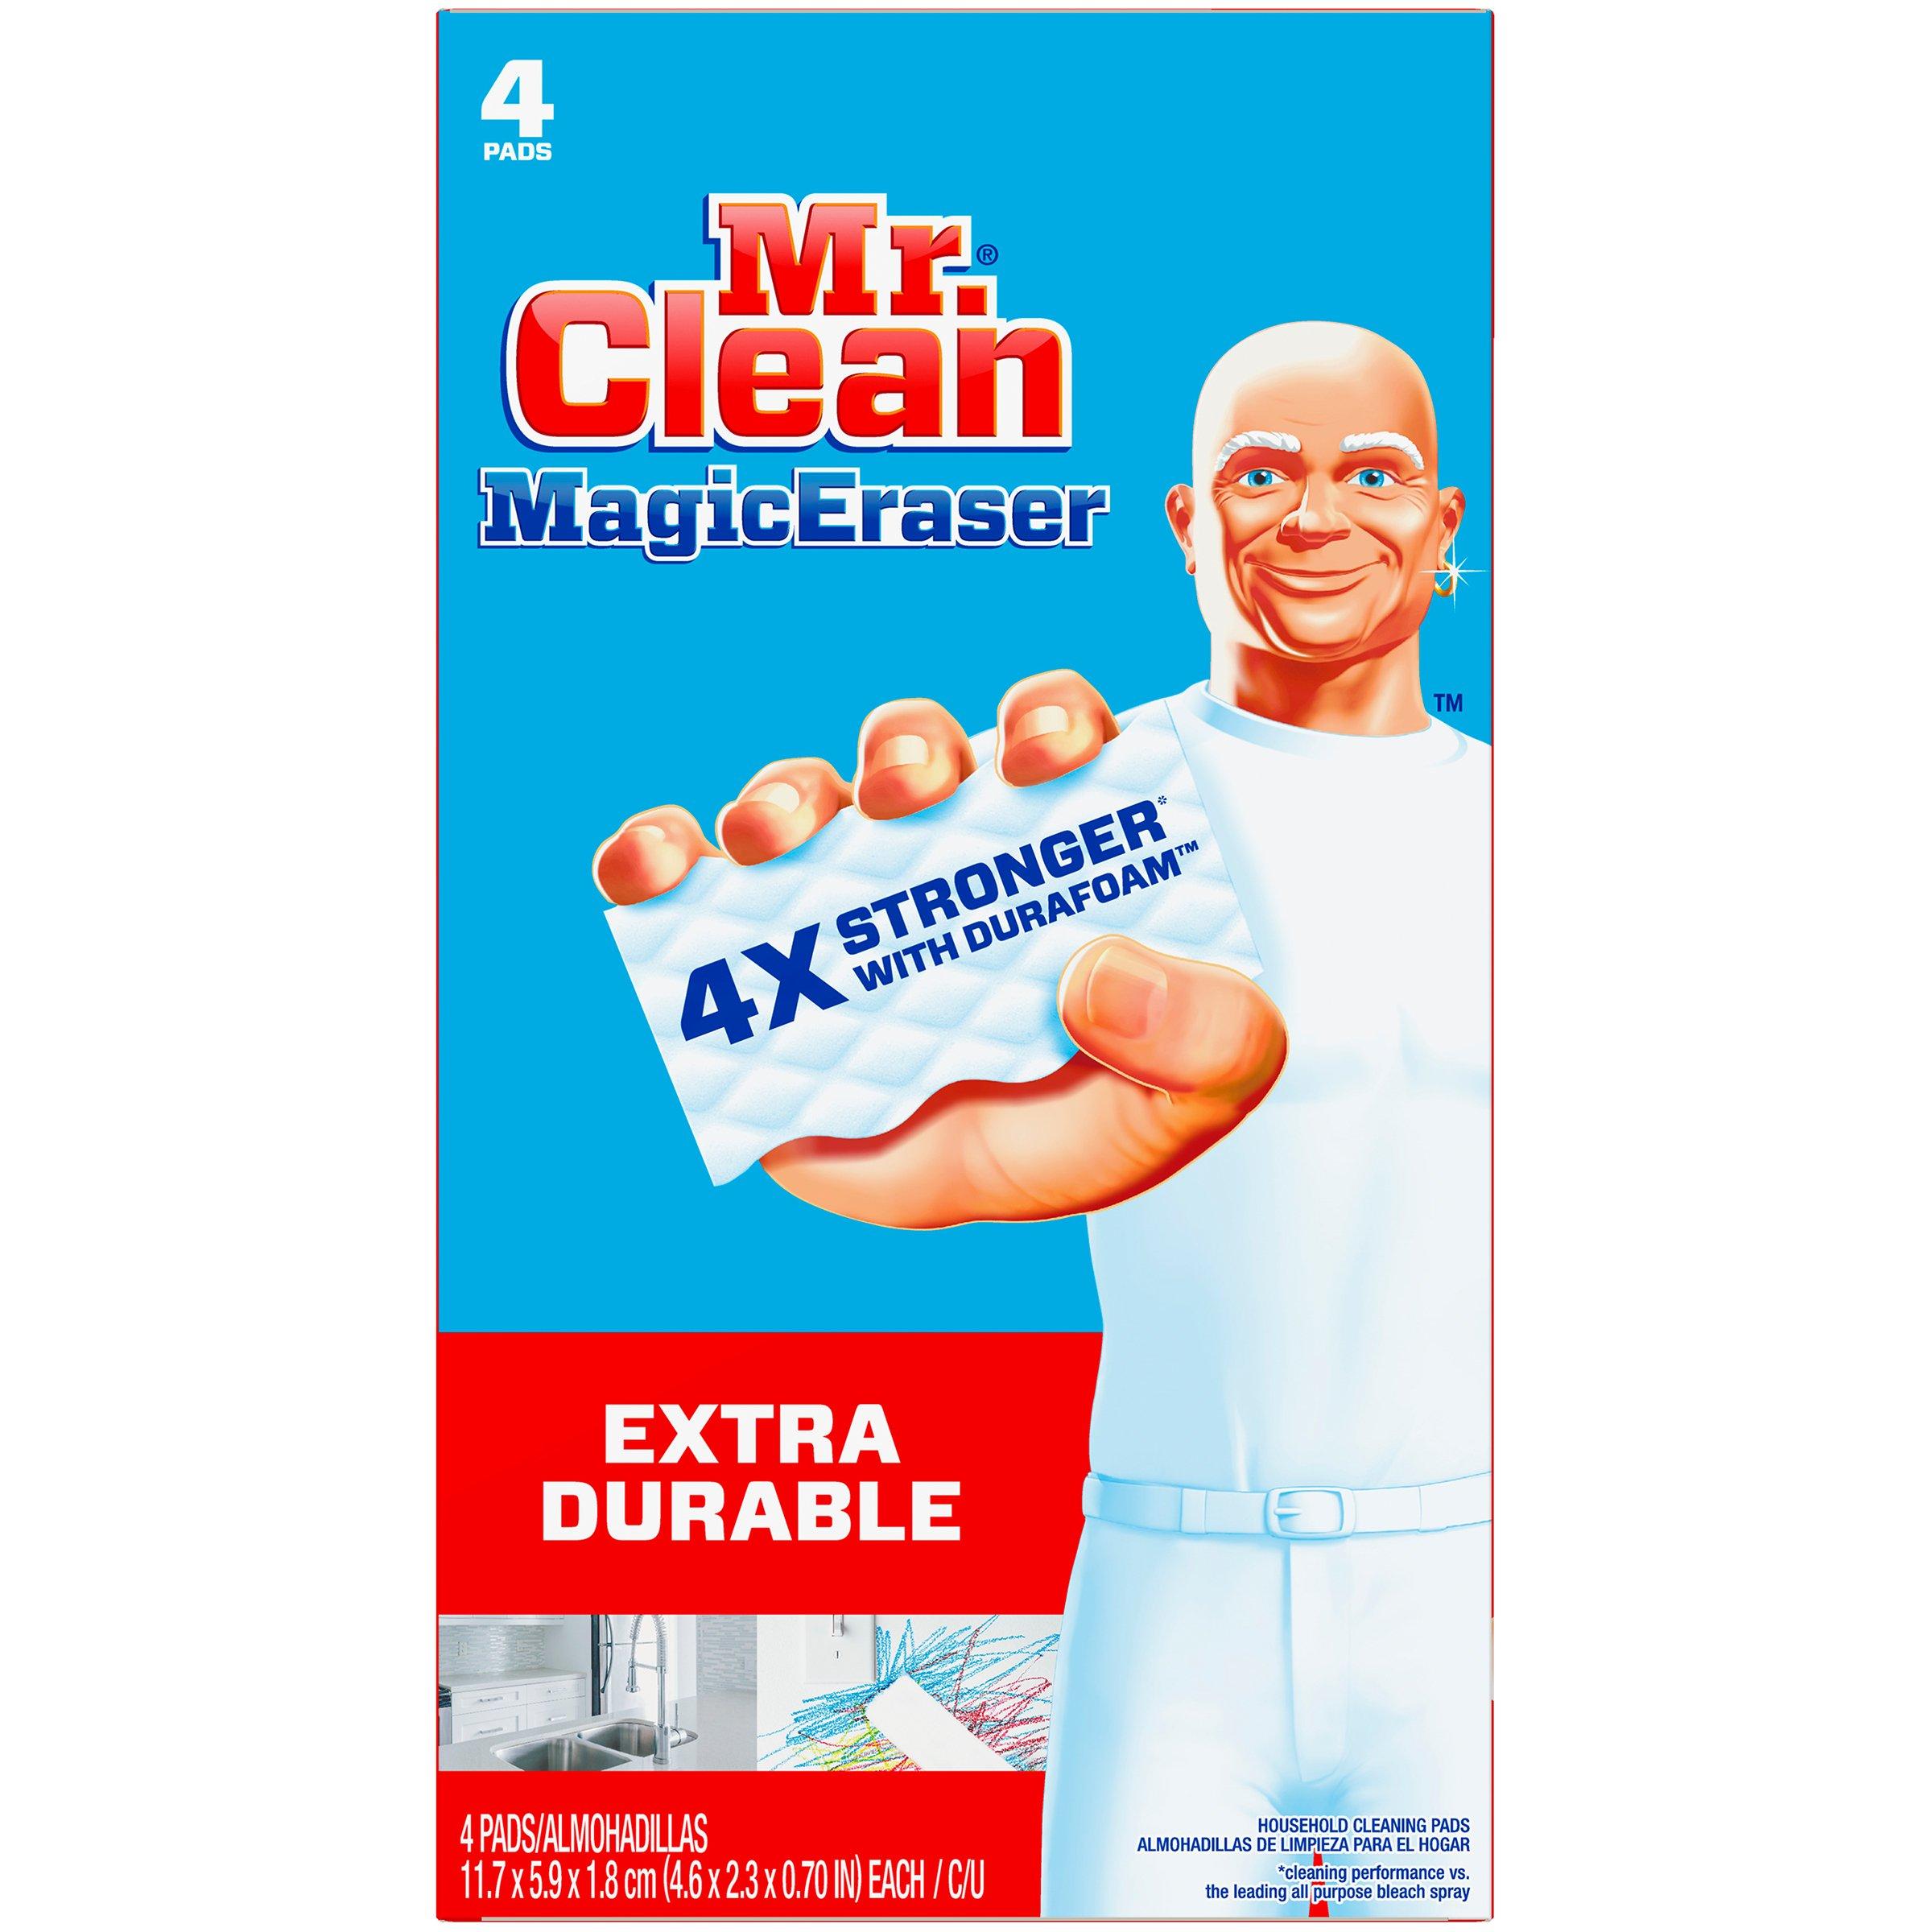 Mr. Clean Magic Eraser Duo Original + Sponge Household Cleaning Pads